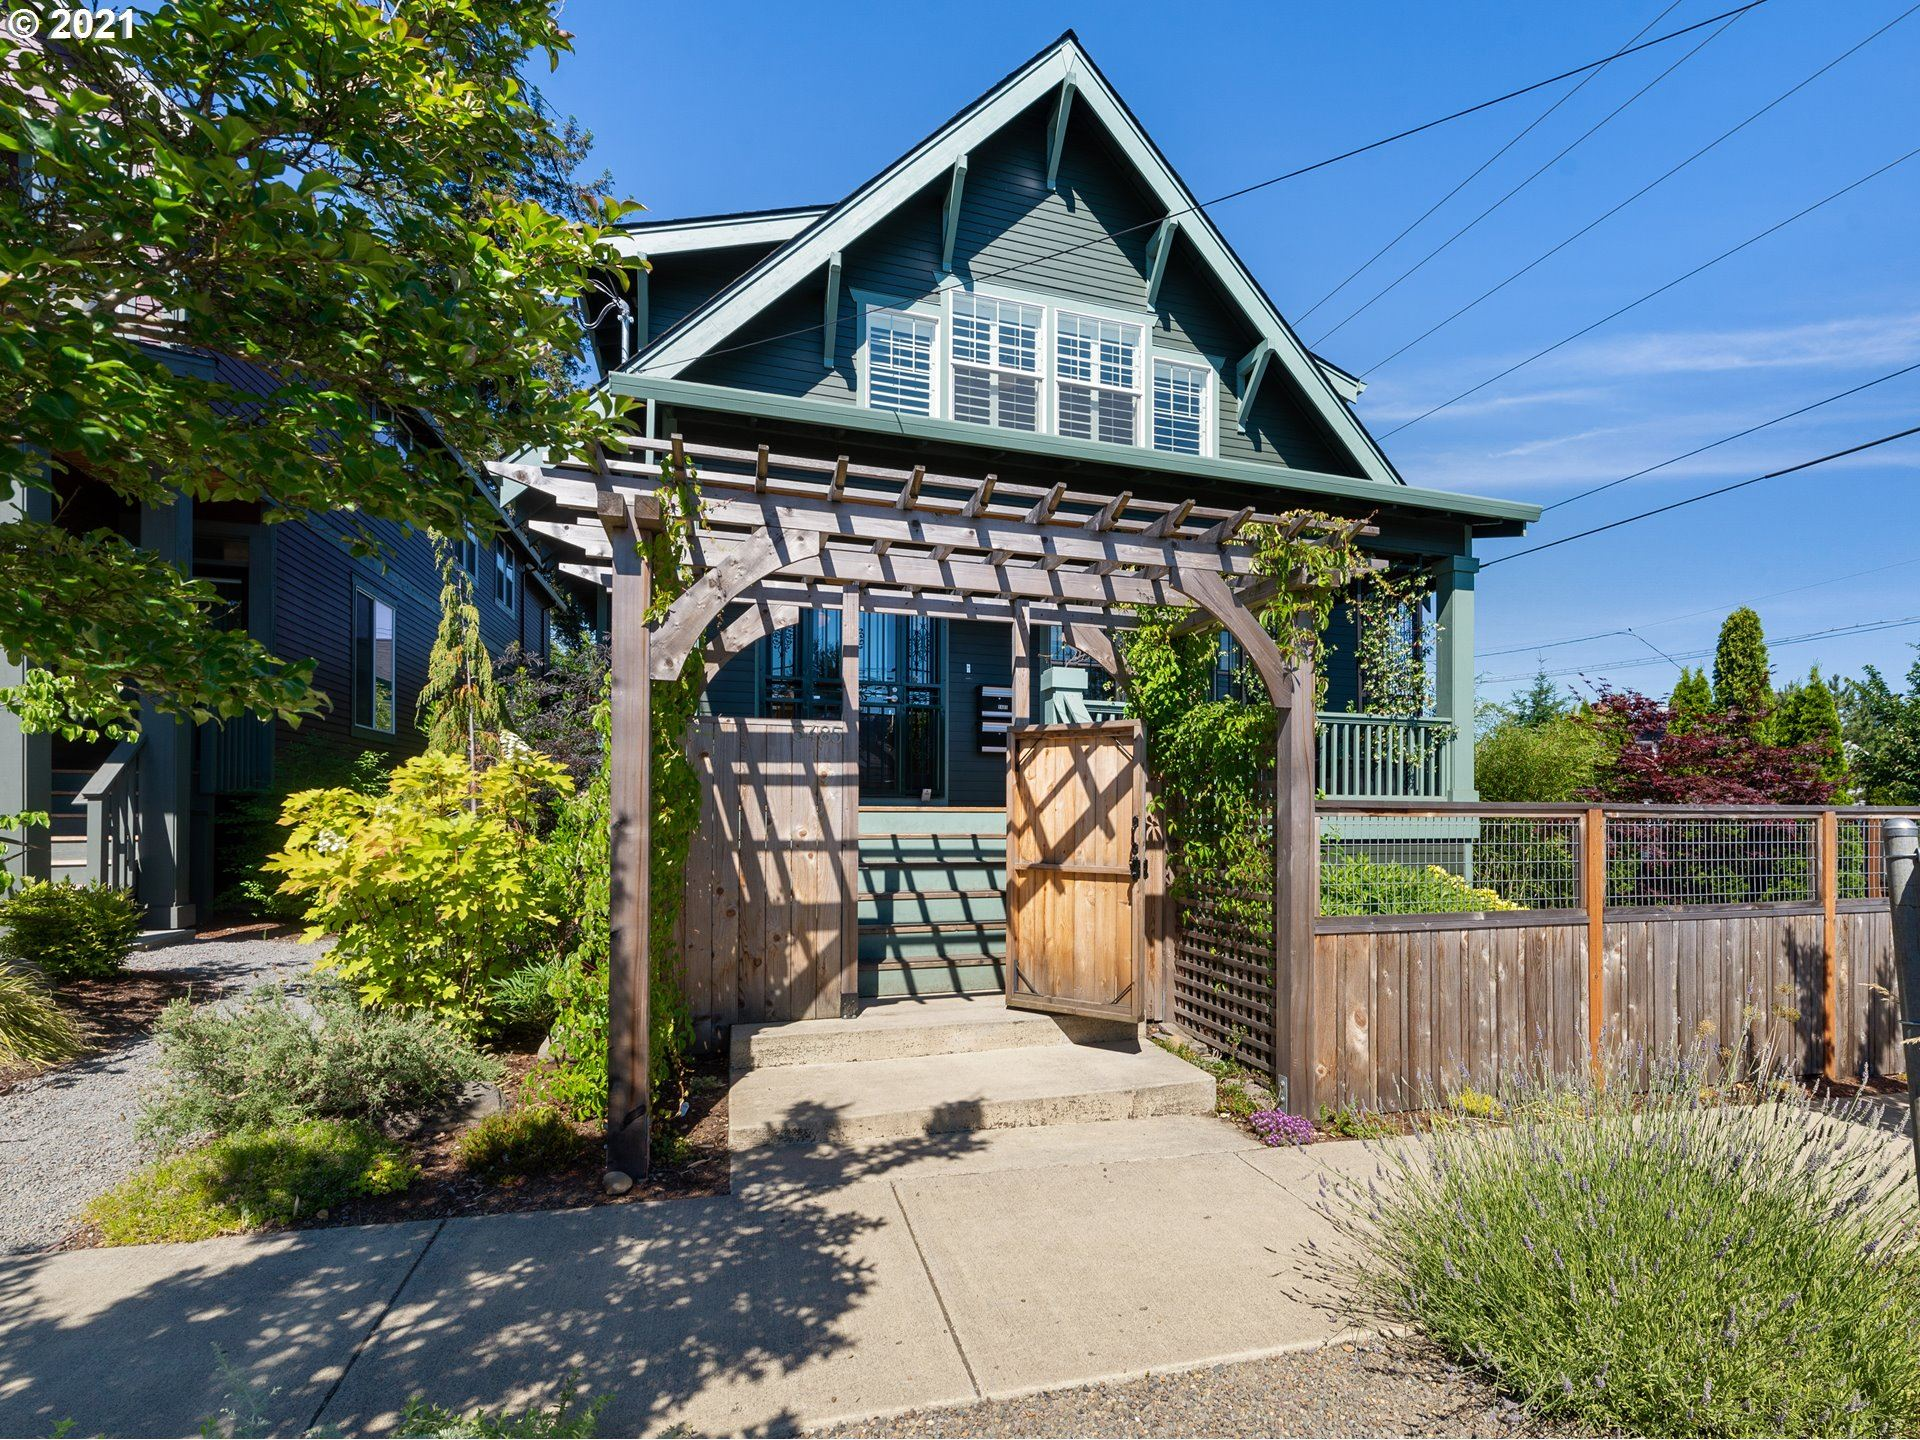 5485 NE 37TH AVE, Portland, OR 97211 - MLS#: 21471285